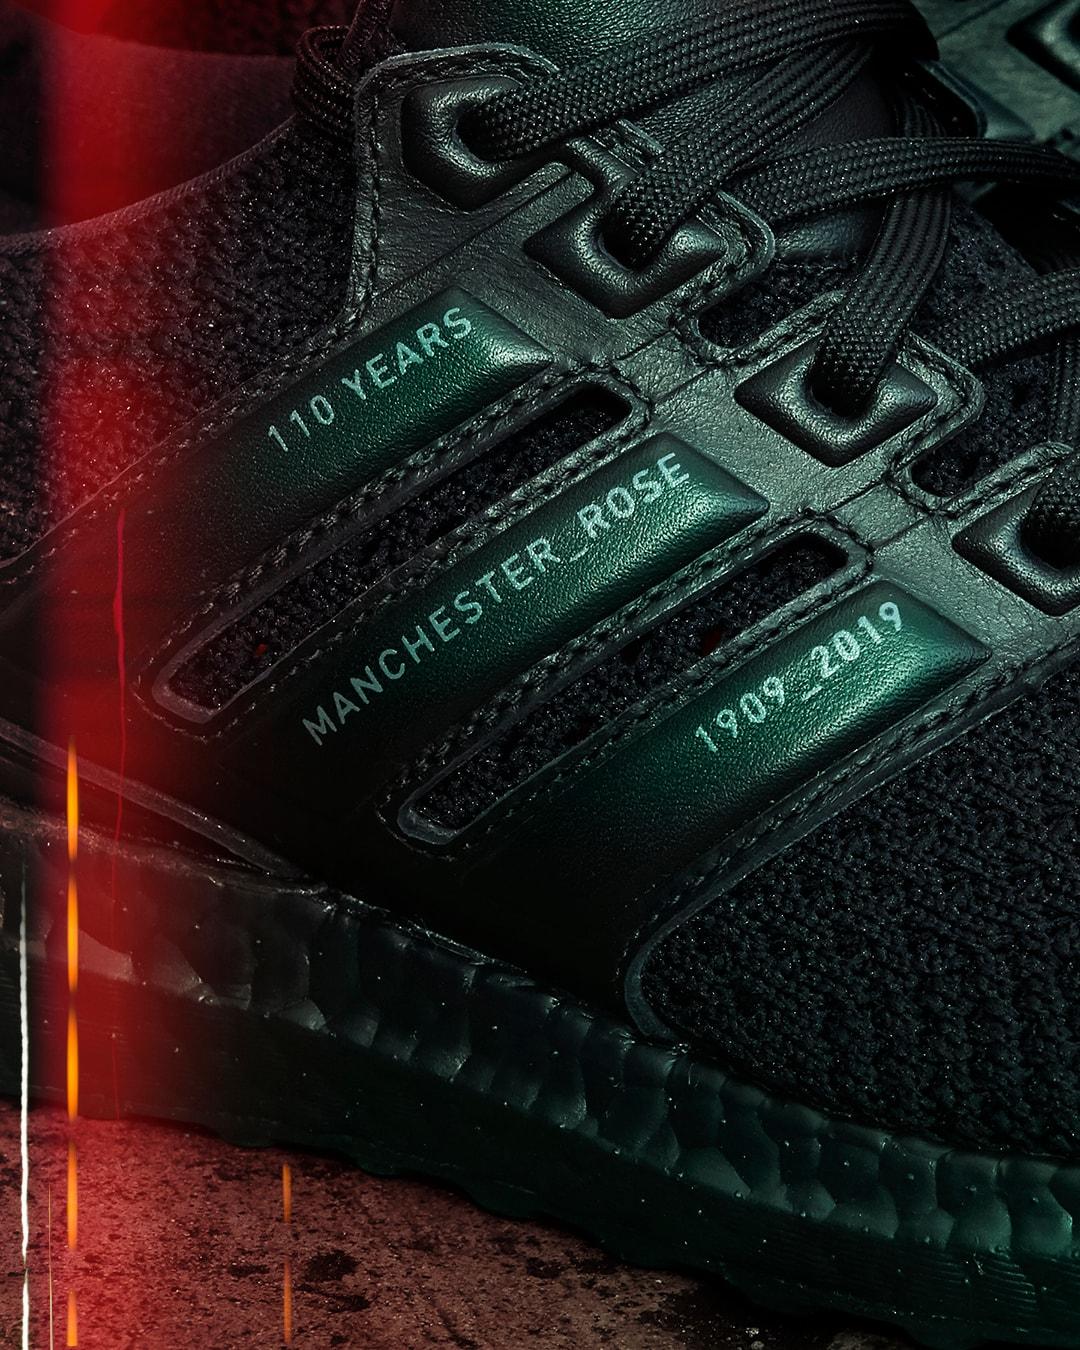 Air Jordan 1「拆線」及 Stone Island x Nike 聯名系列等本週不容錯過的 7 項新品發售